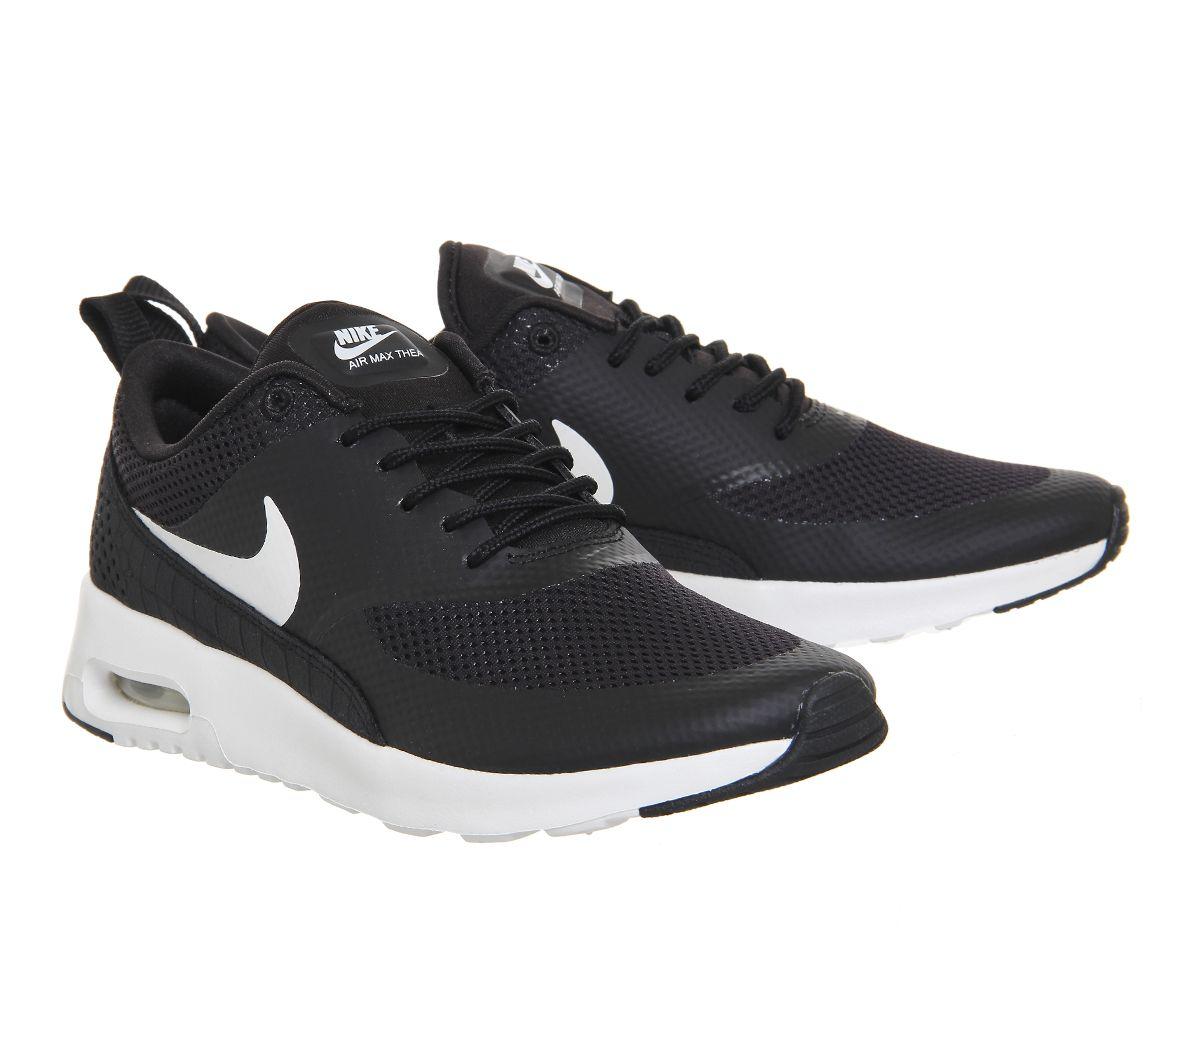 buy popular 28816 0f2a0 Nike Air Max Thea Black White - junior